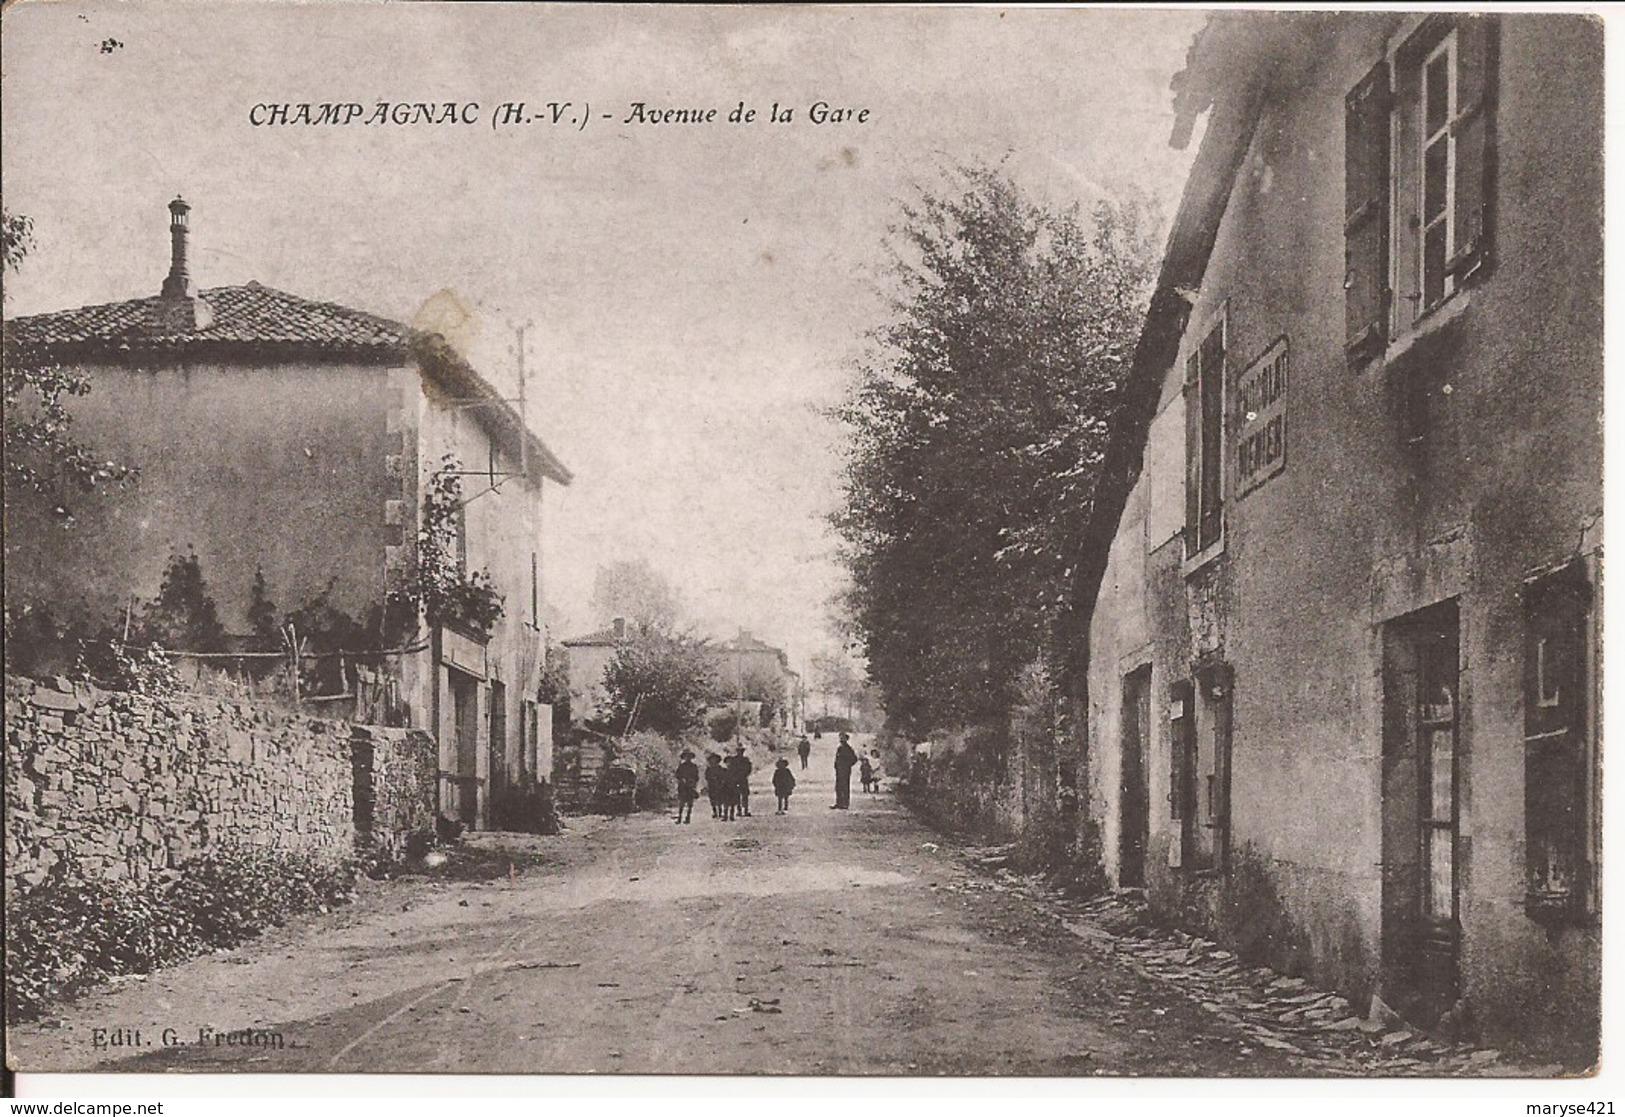 CHAMPAGNAC AVENUE DE LA GARE - France